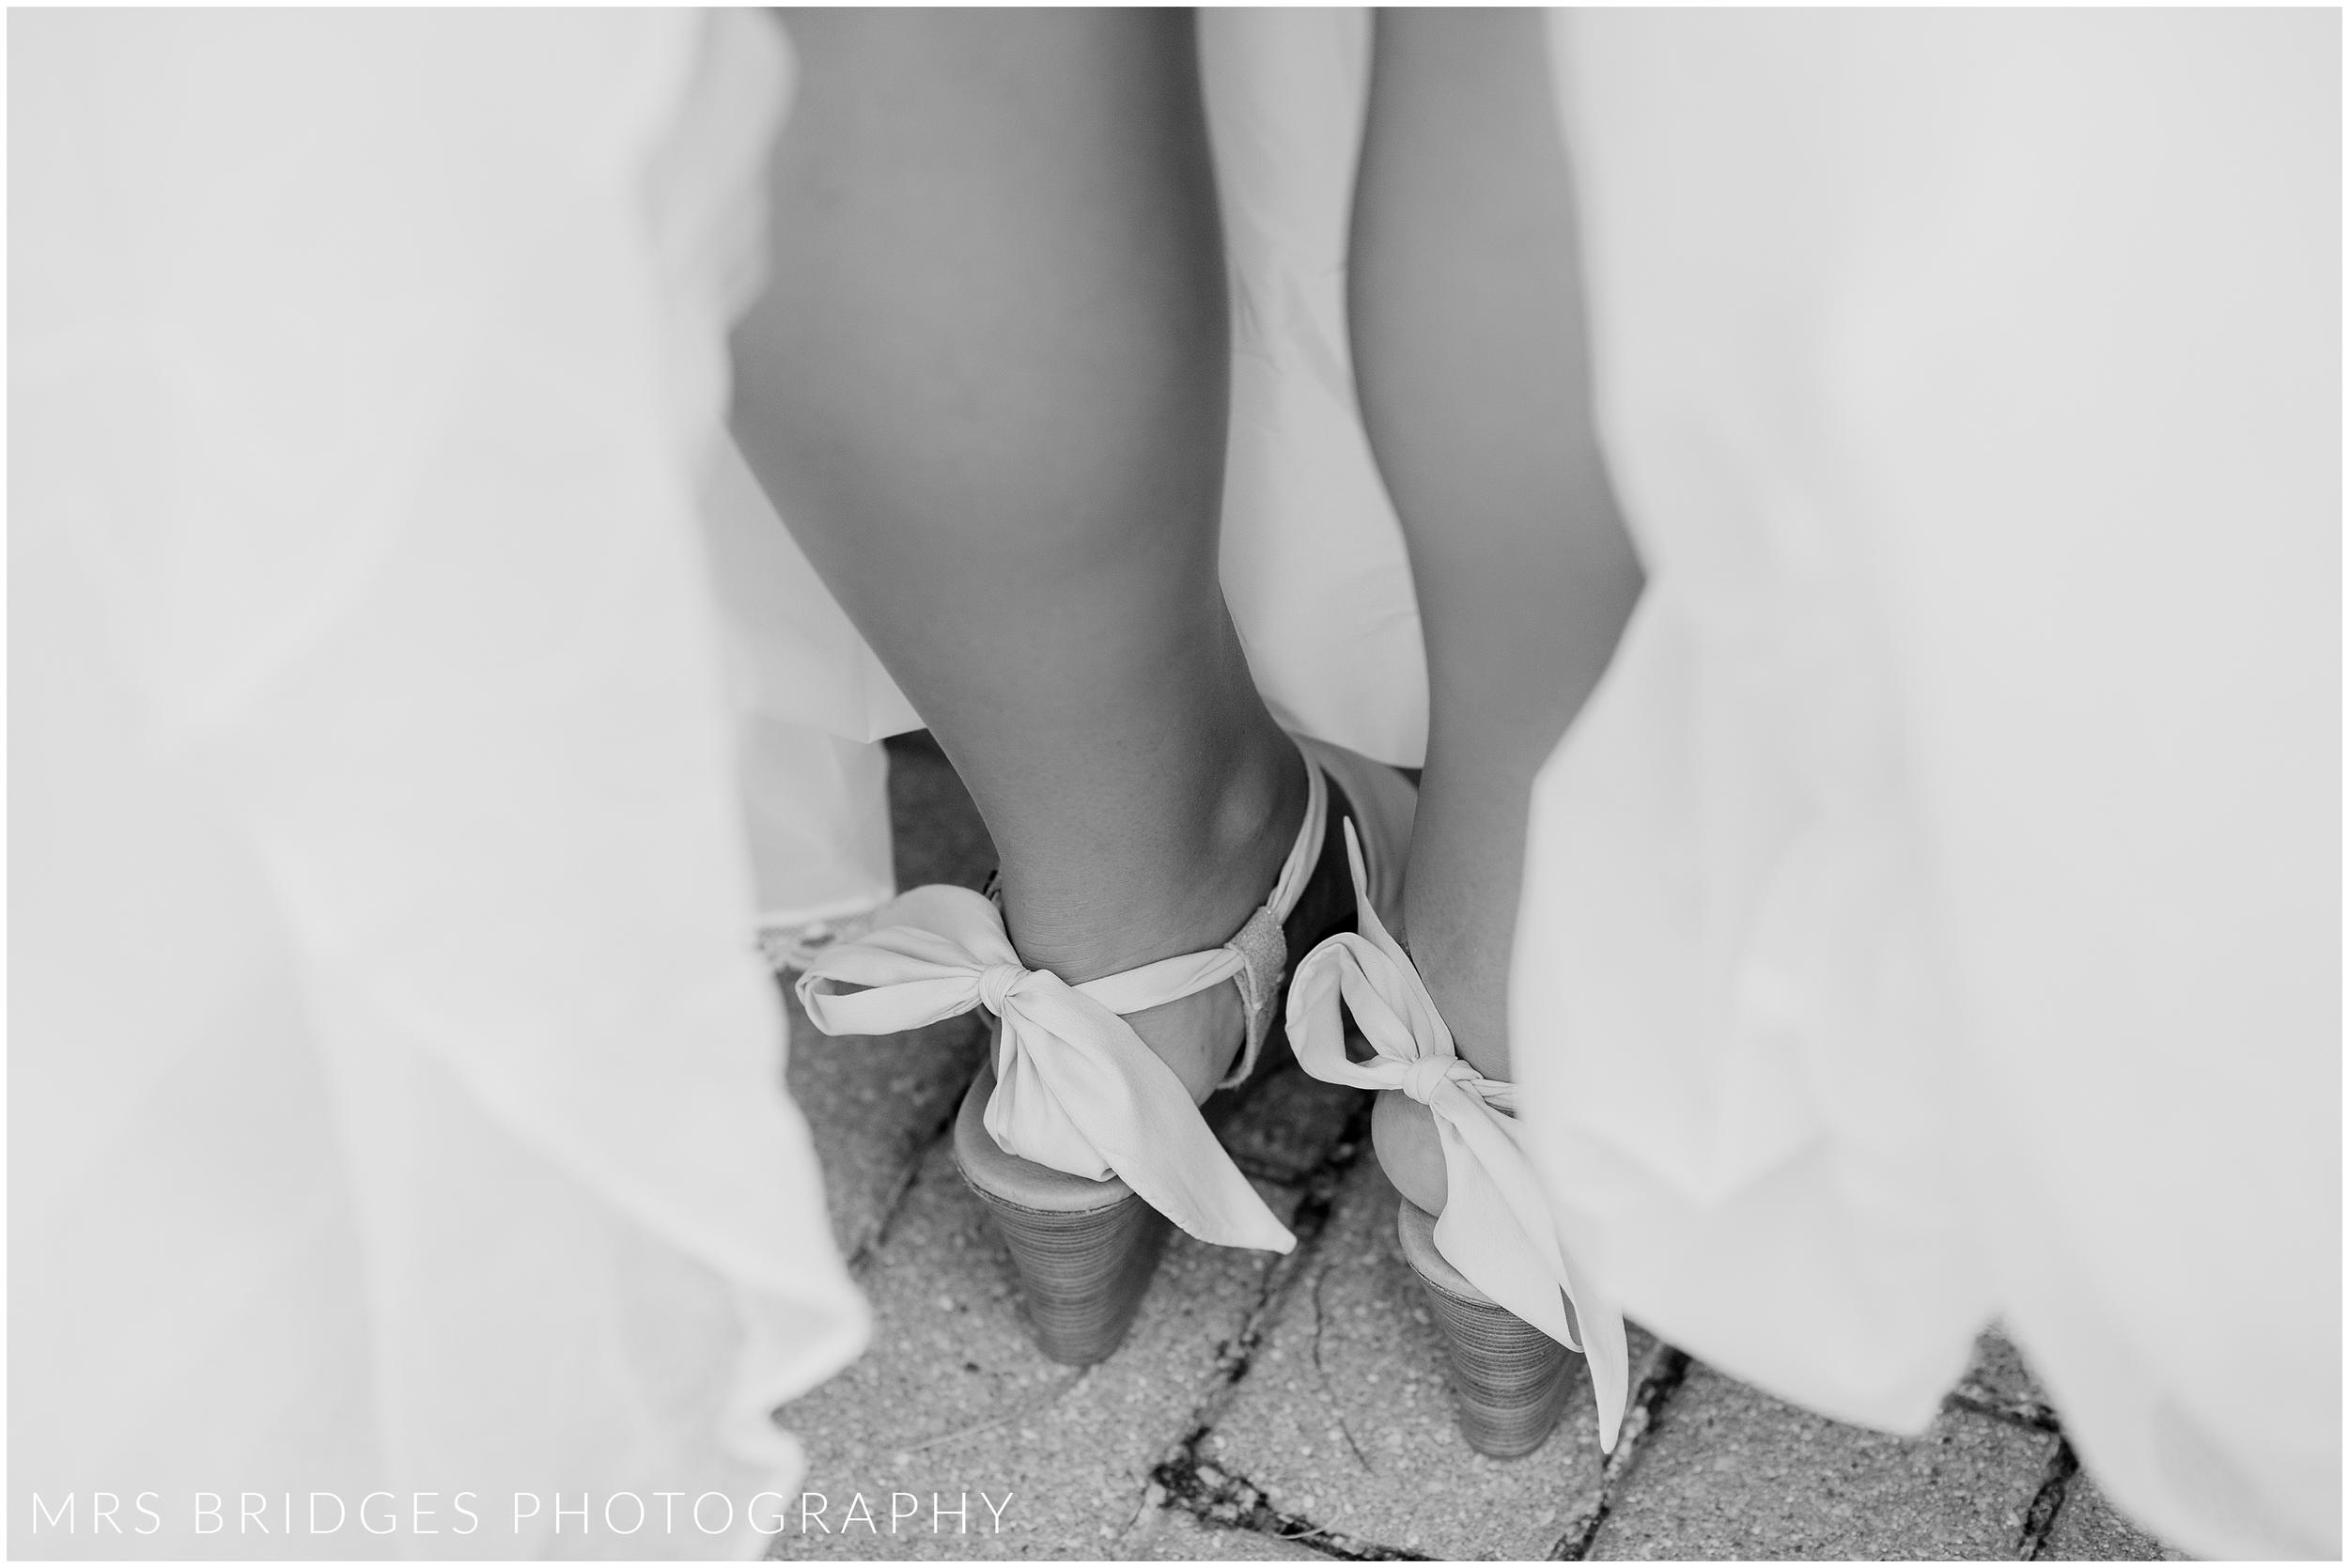 Rebecca_Bridges_Photography__2900.jpg